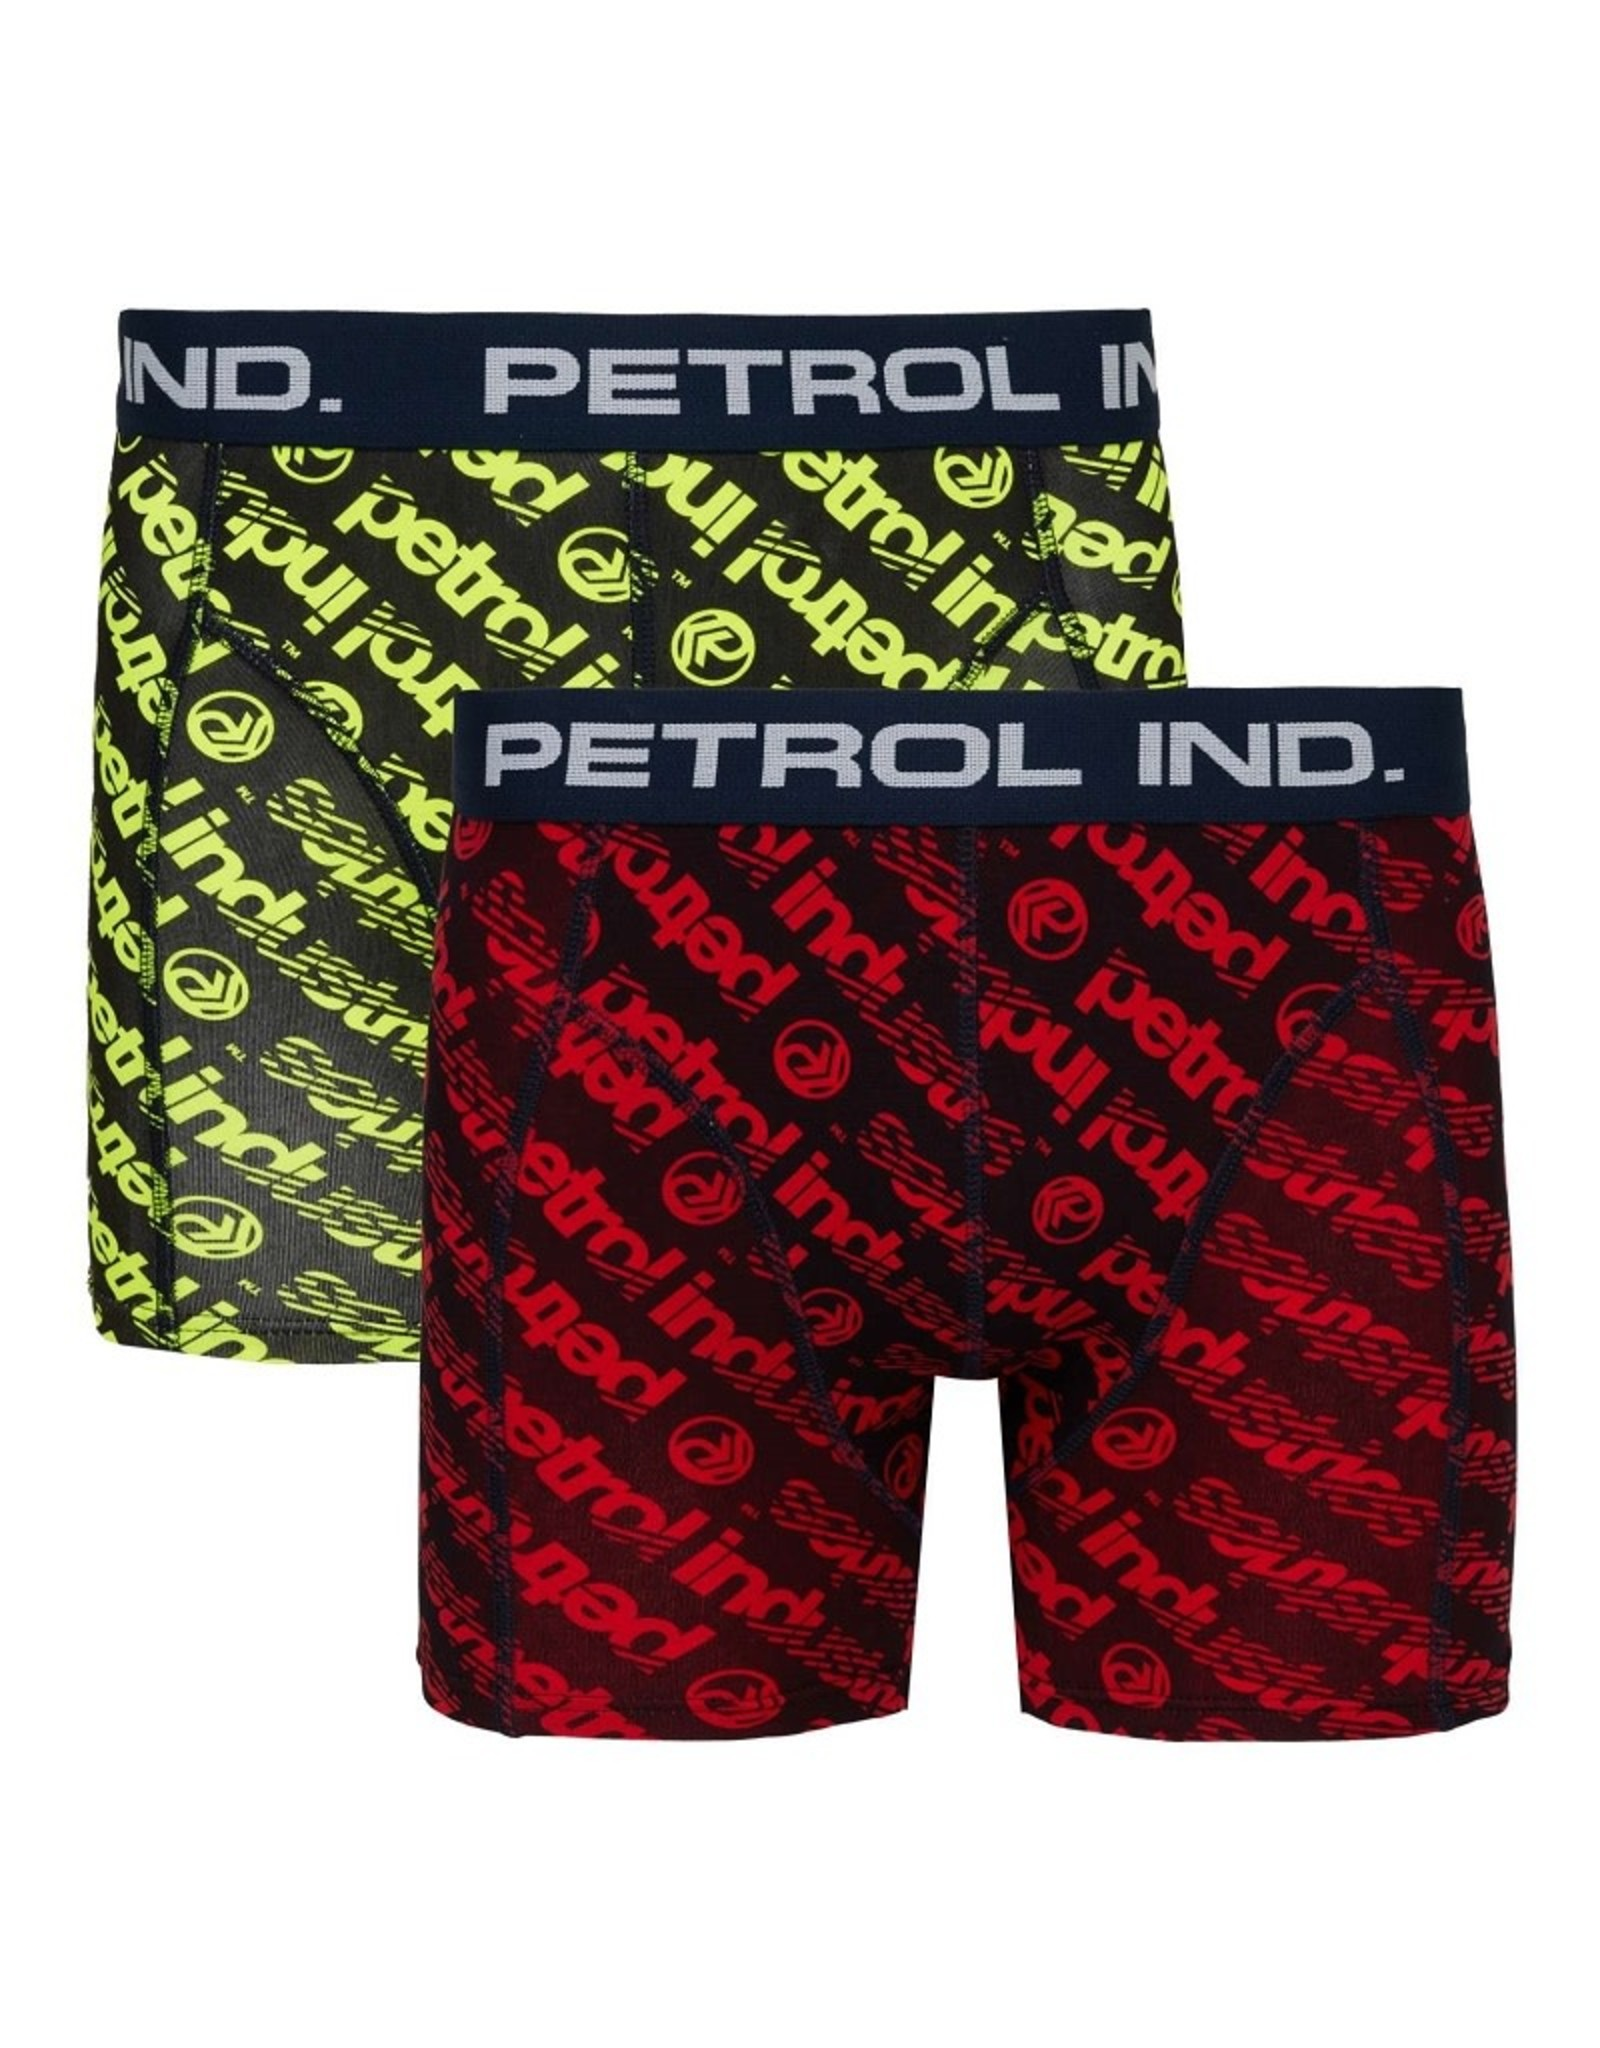 Petrol Ind. Petrol boxershorts 2 Pack